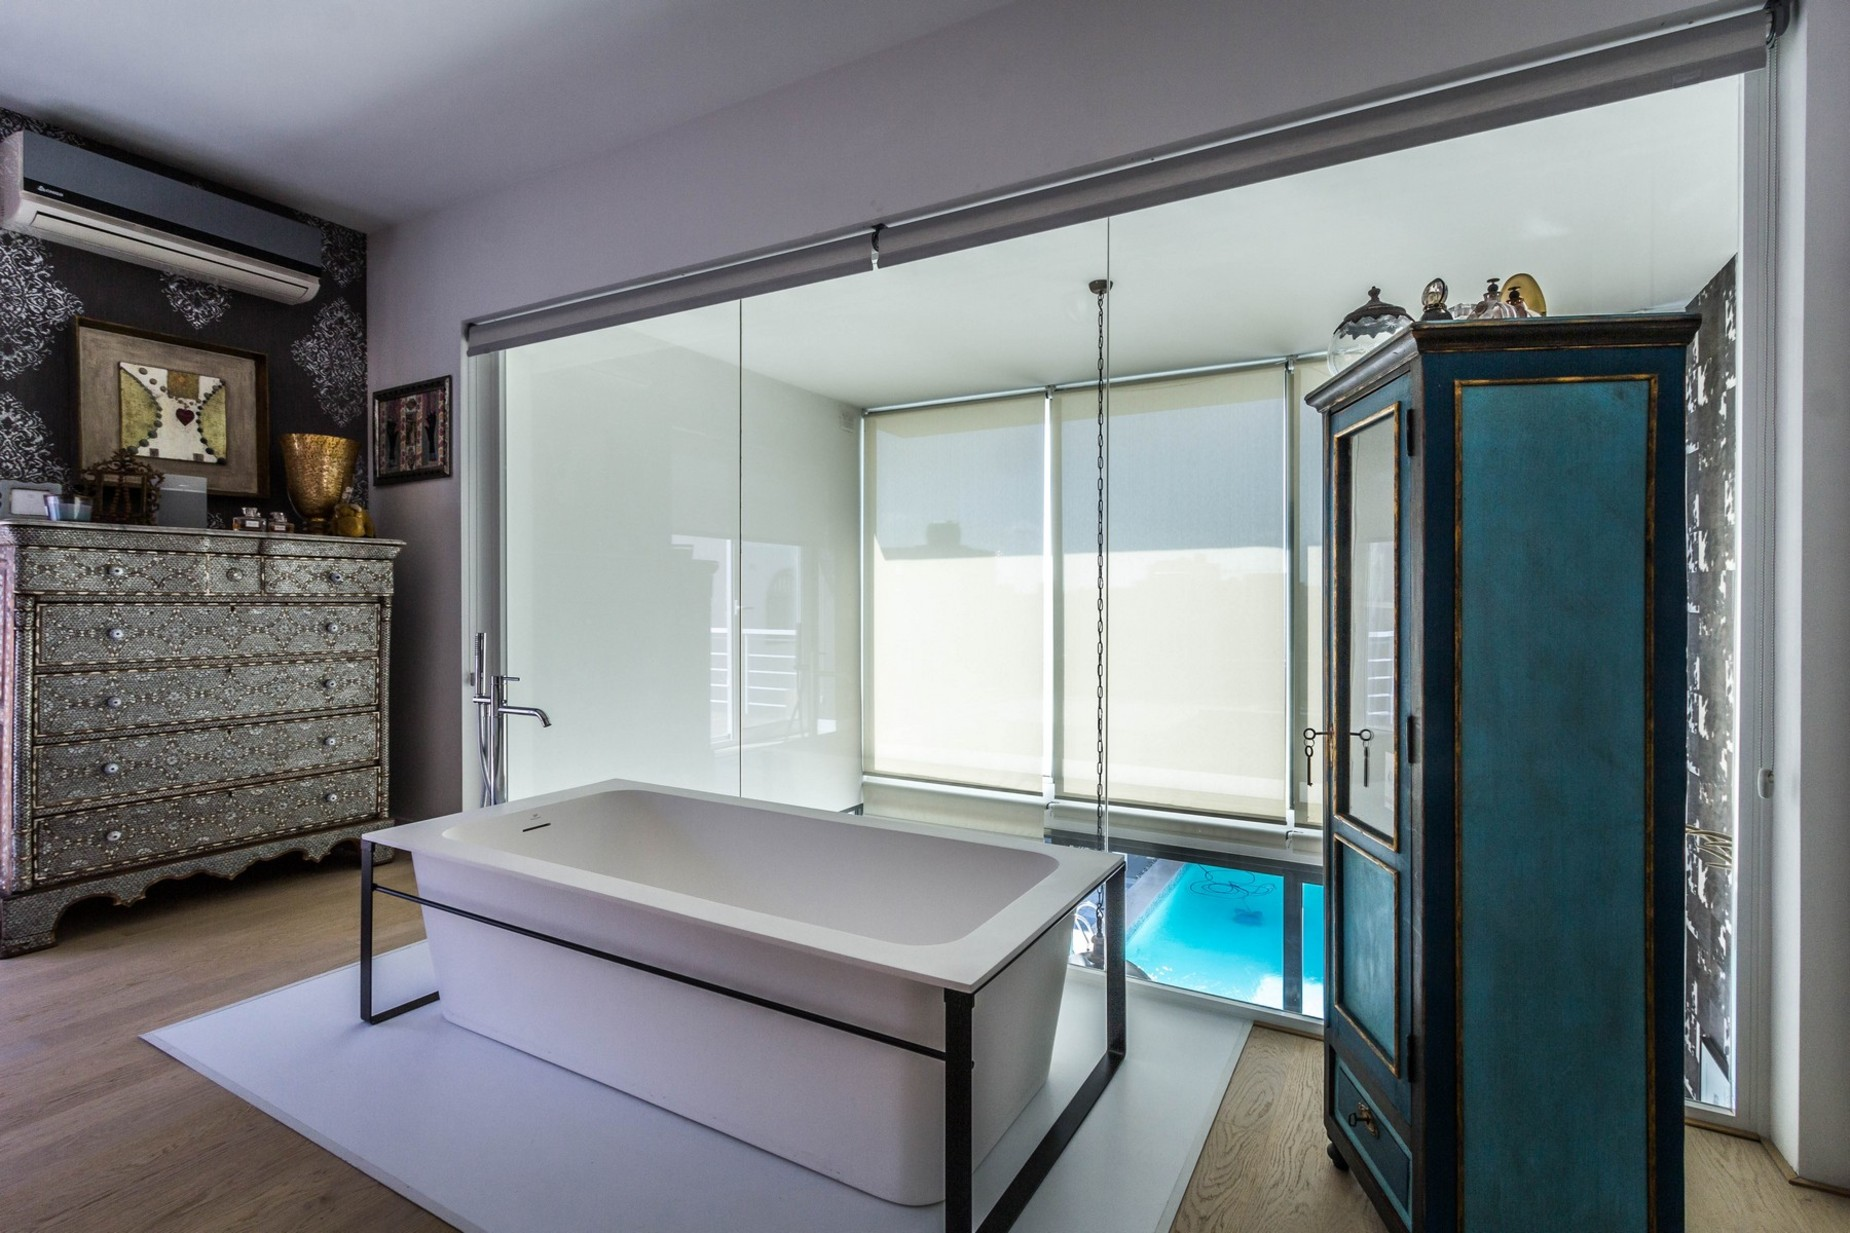 3 bed Villa For Sale in San Gwann, San Gwann - thumb 10